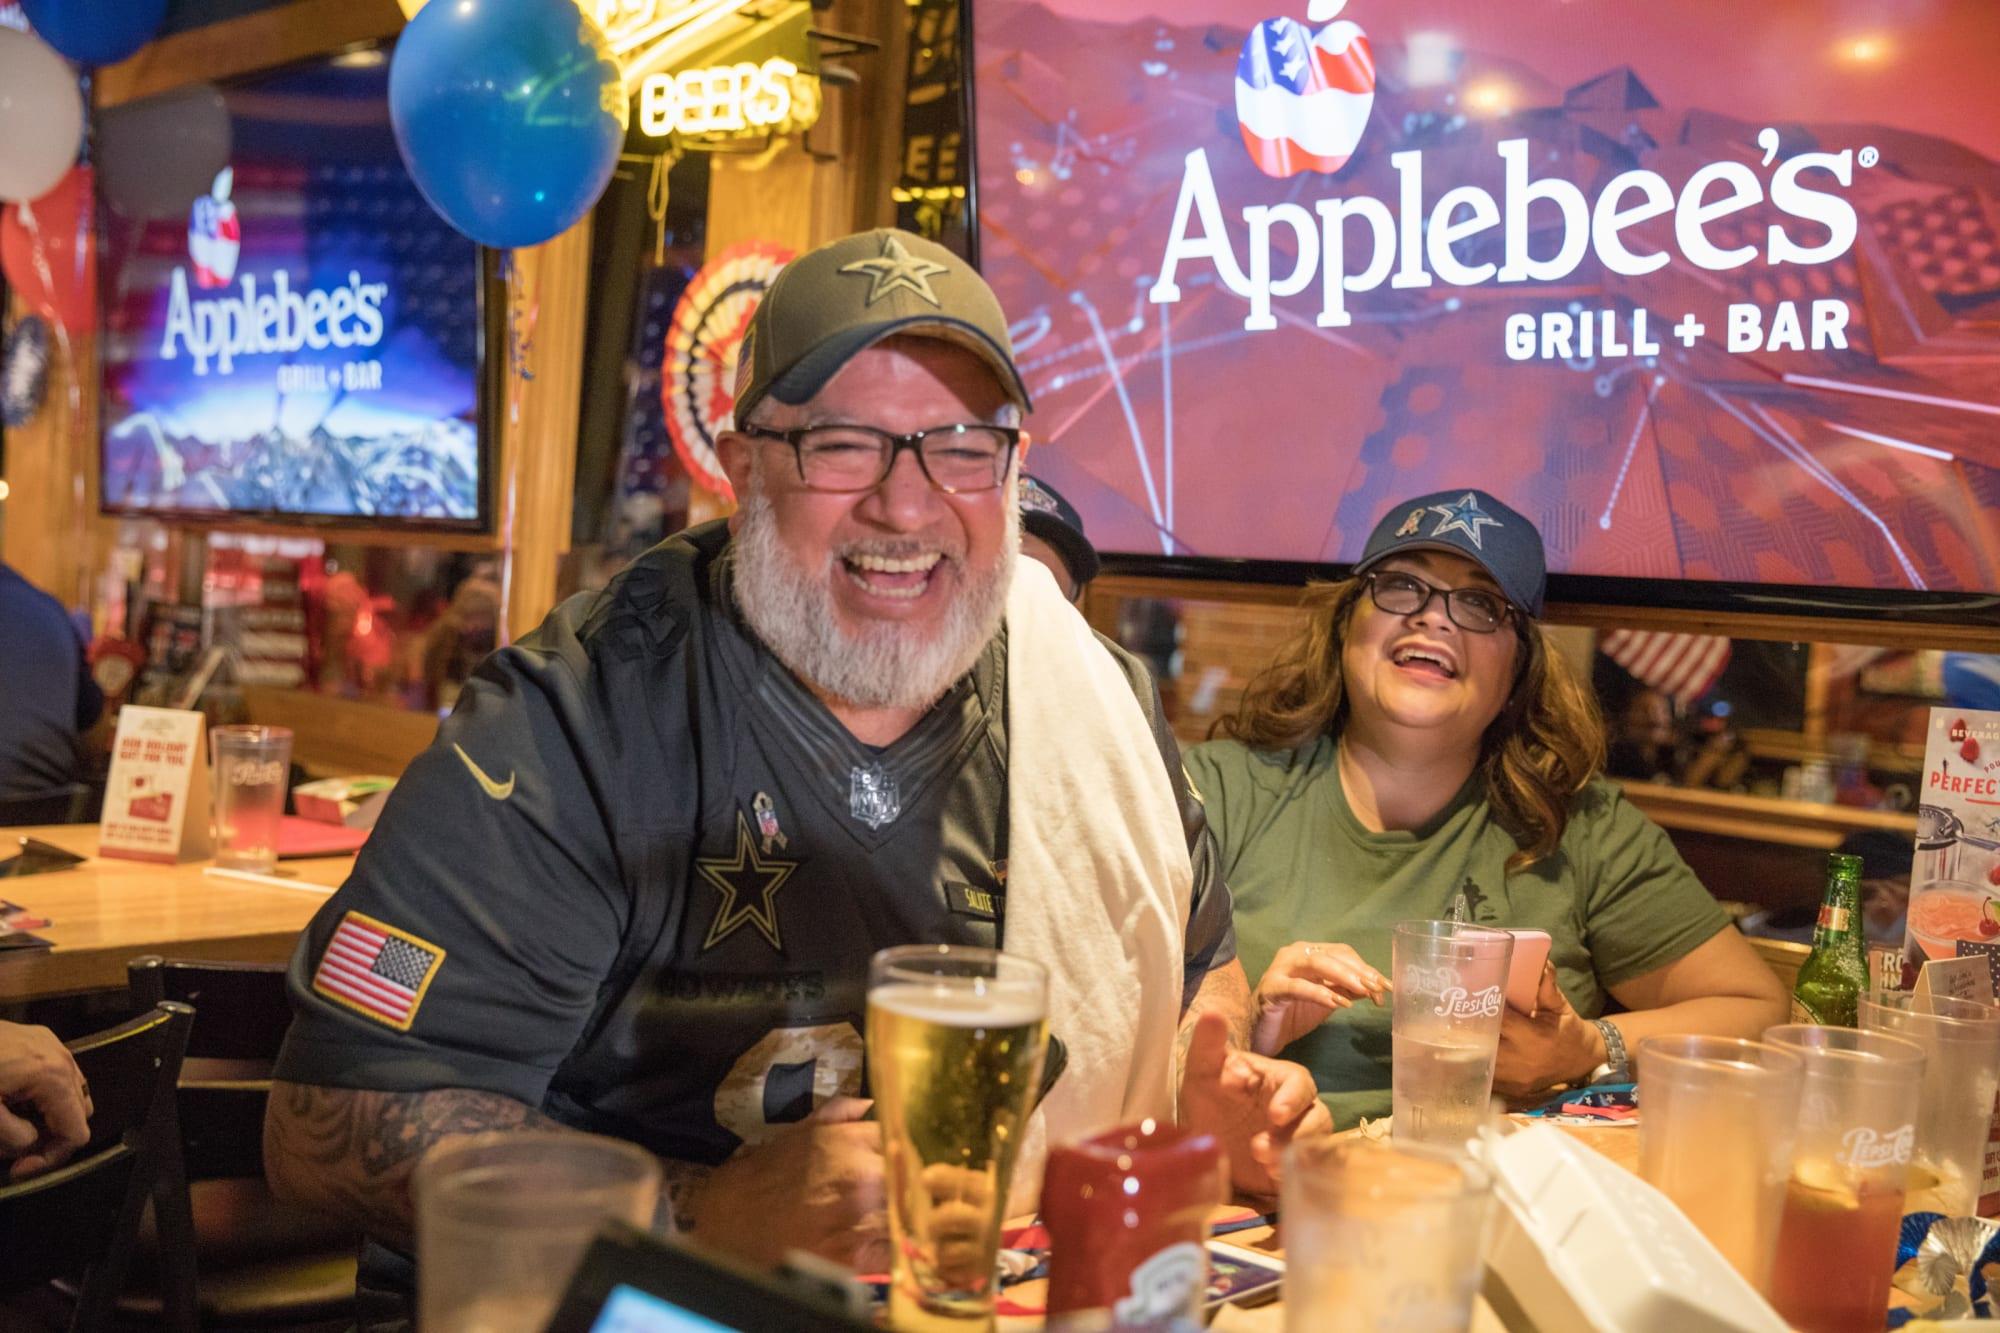 Applebees menu: Irresist-A-Bowls are back!